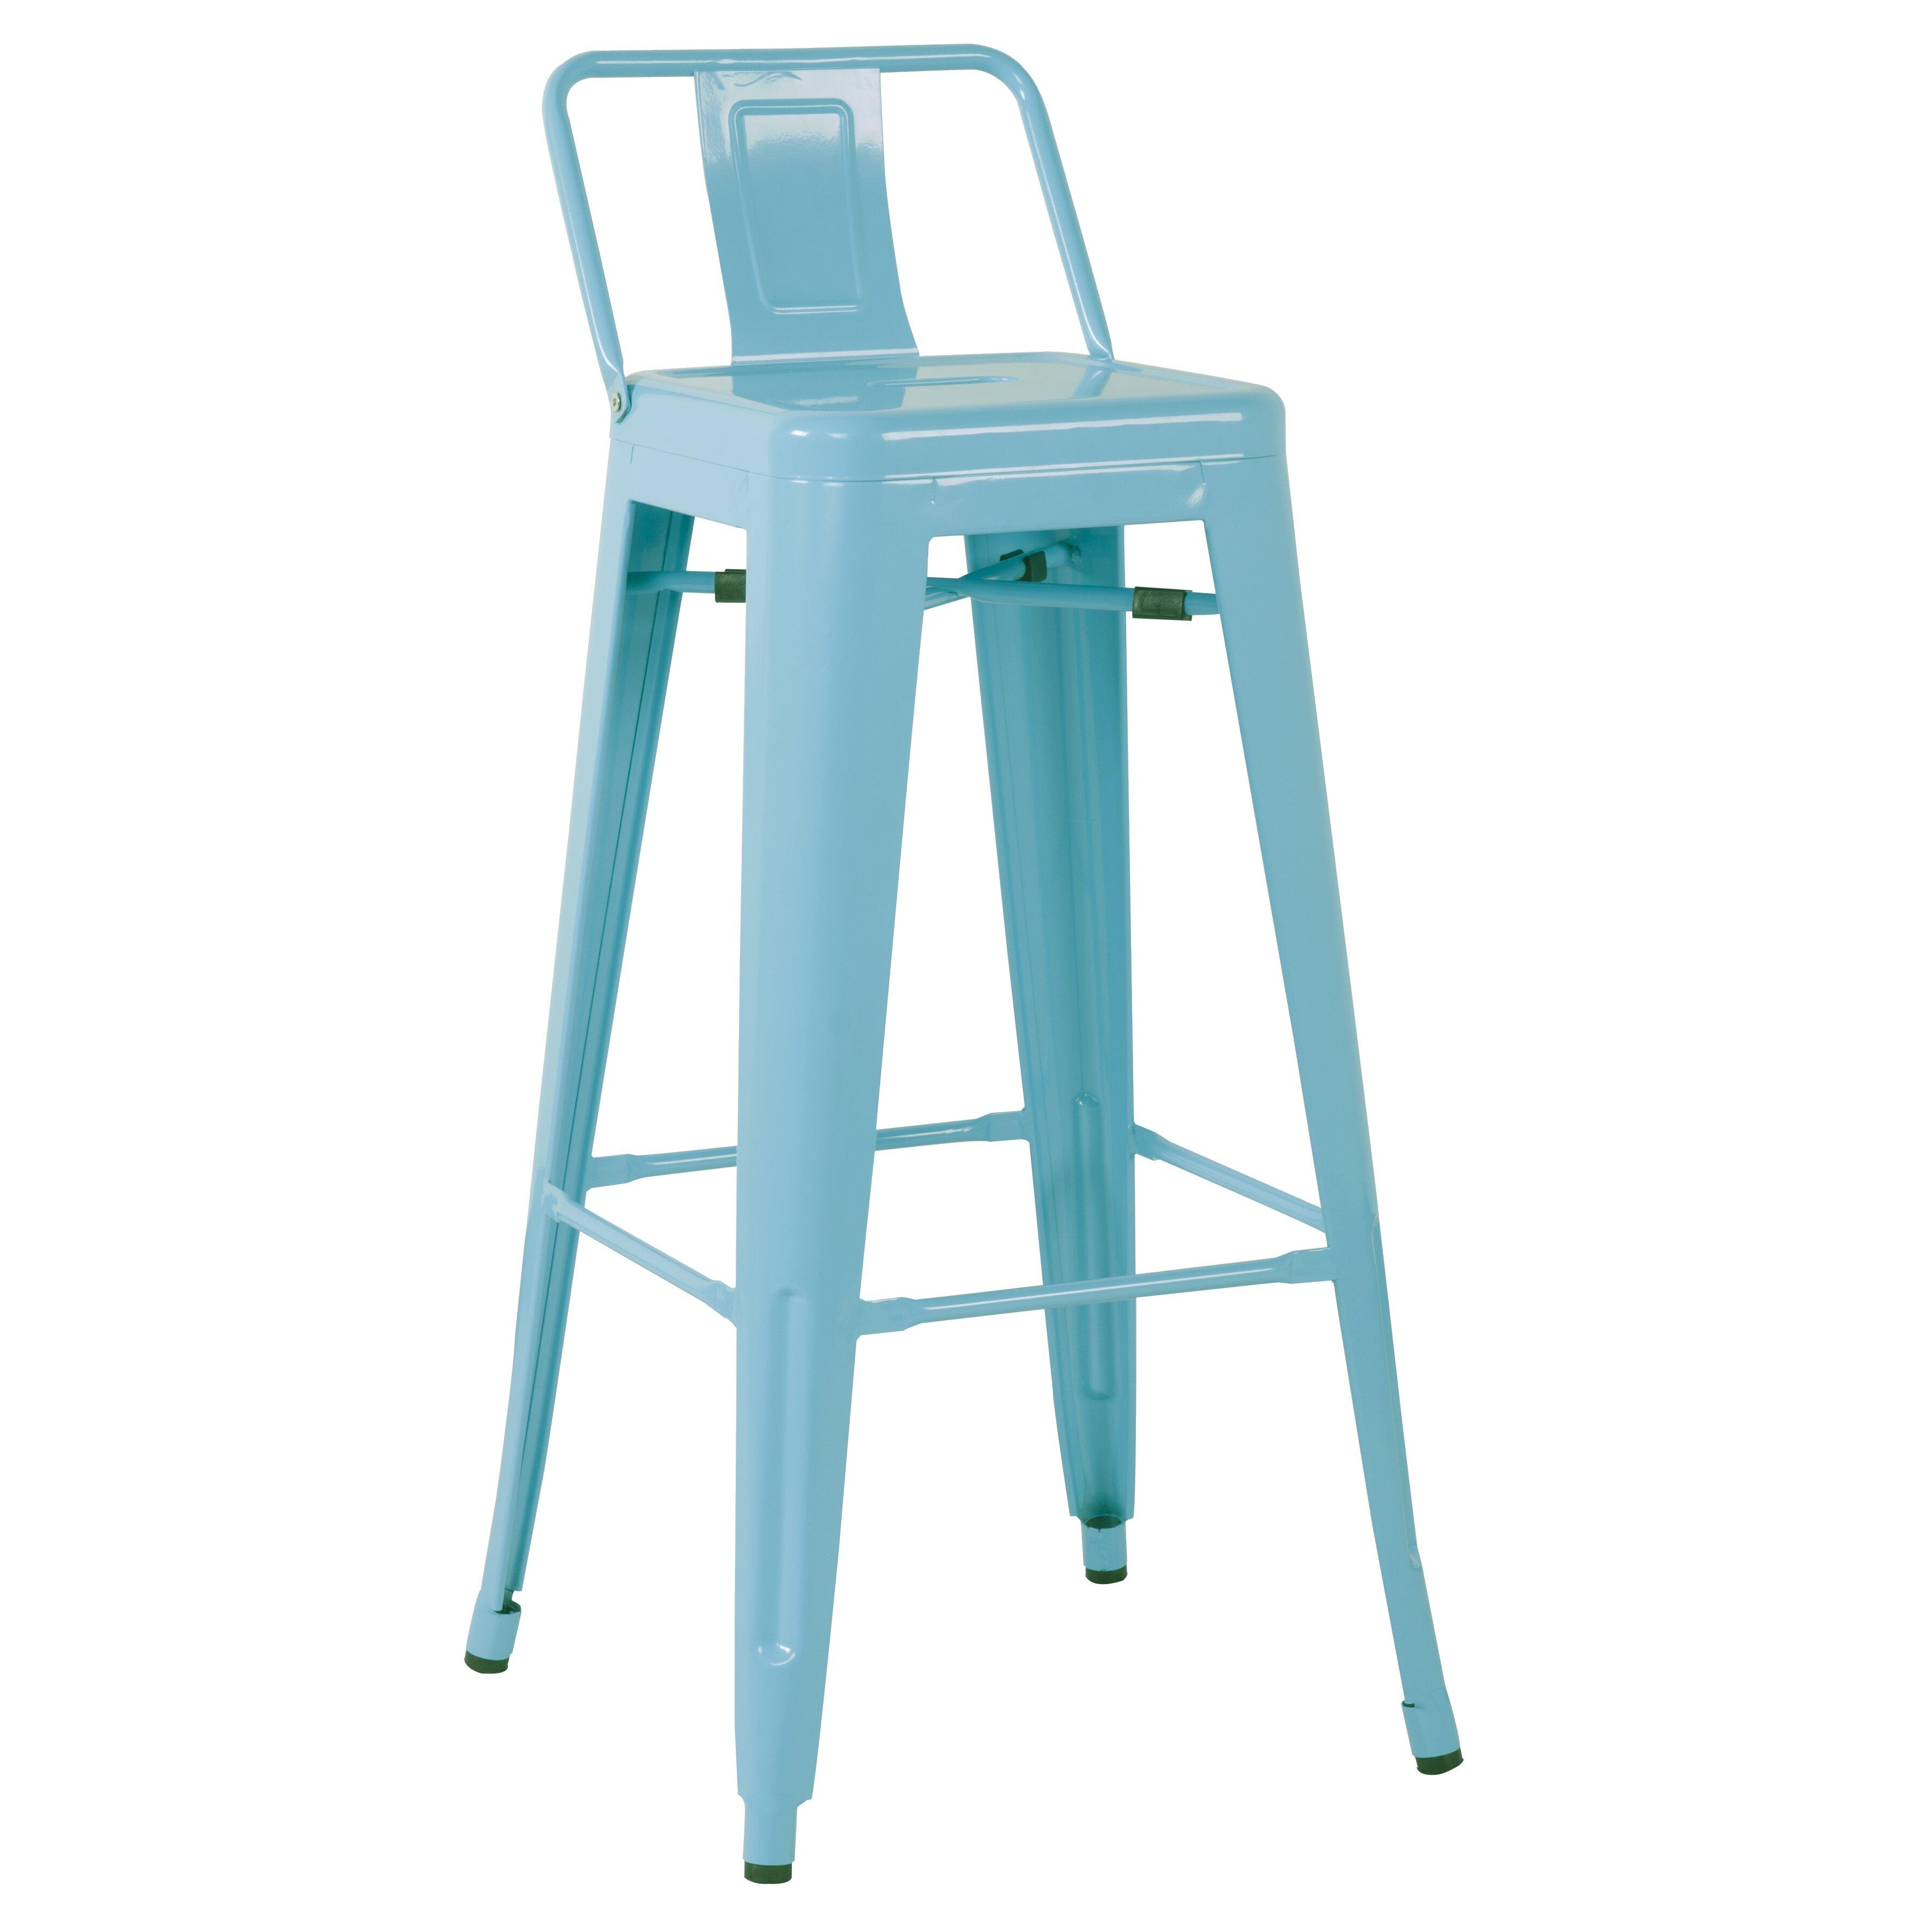 chintaly alfresco 30 bar stool reviews wayfair. Black Bedroom Furniture Sets. Home Design Ideas